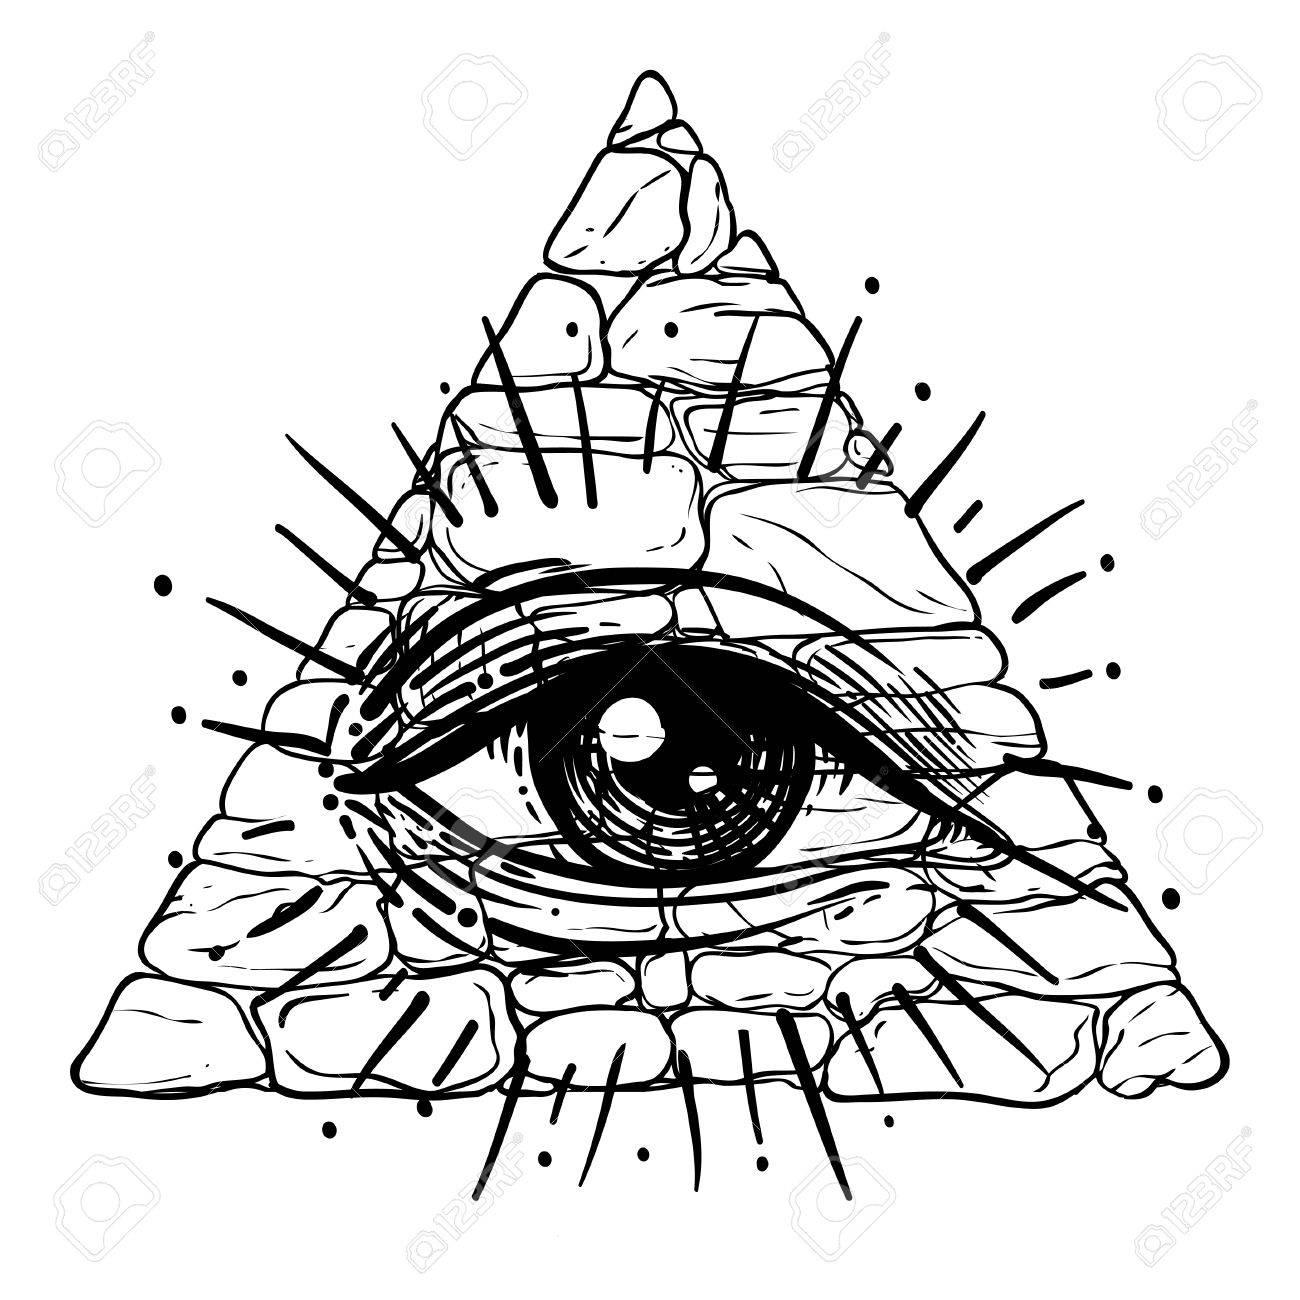 Eye of providence masonic symbol all seeing eye inside triangle masonic symbol all seeing eye inside triangle pyramid new world biocorpaavc Gallery